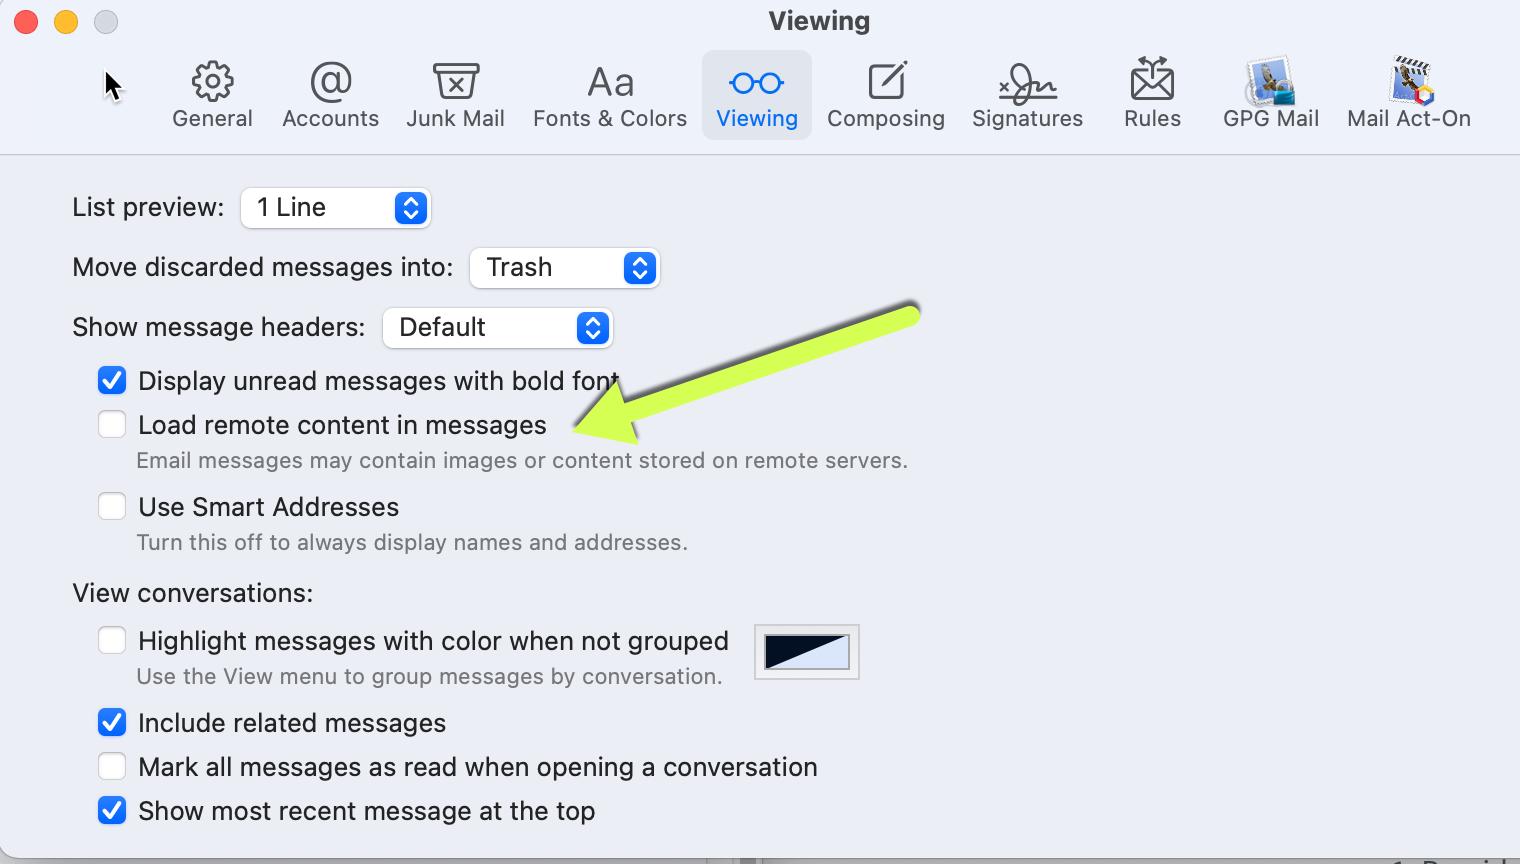 Image loading turned off in Apple macOS Big Sur (6/2021)